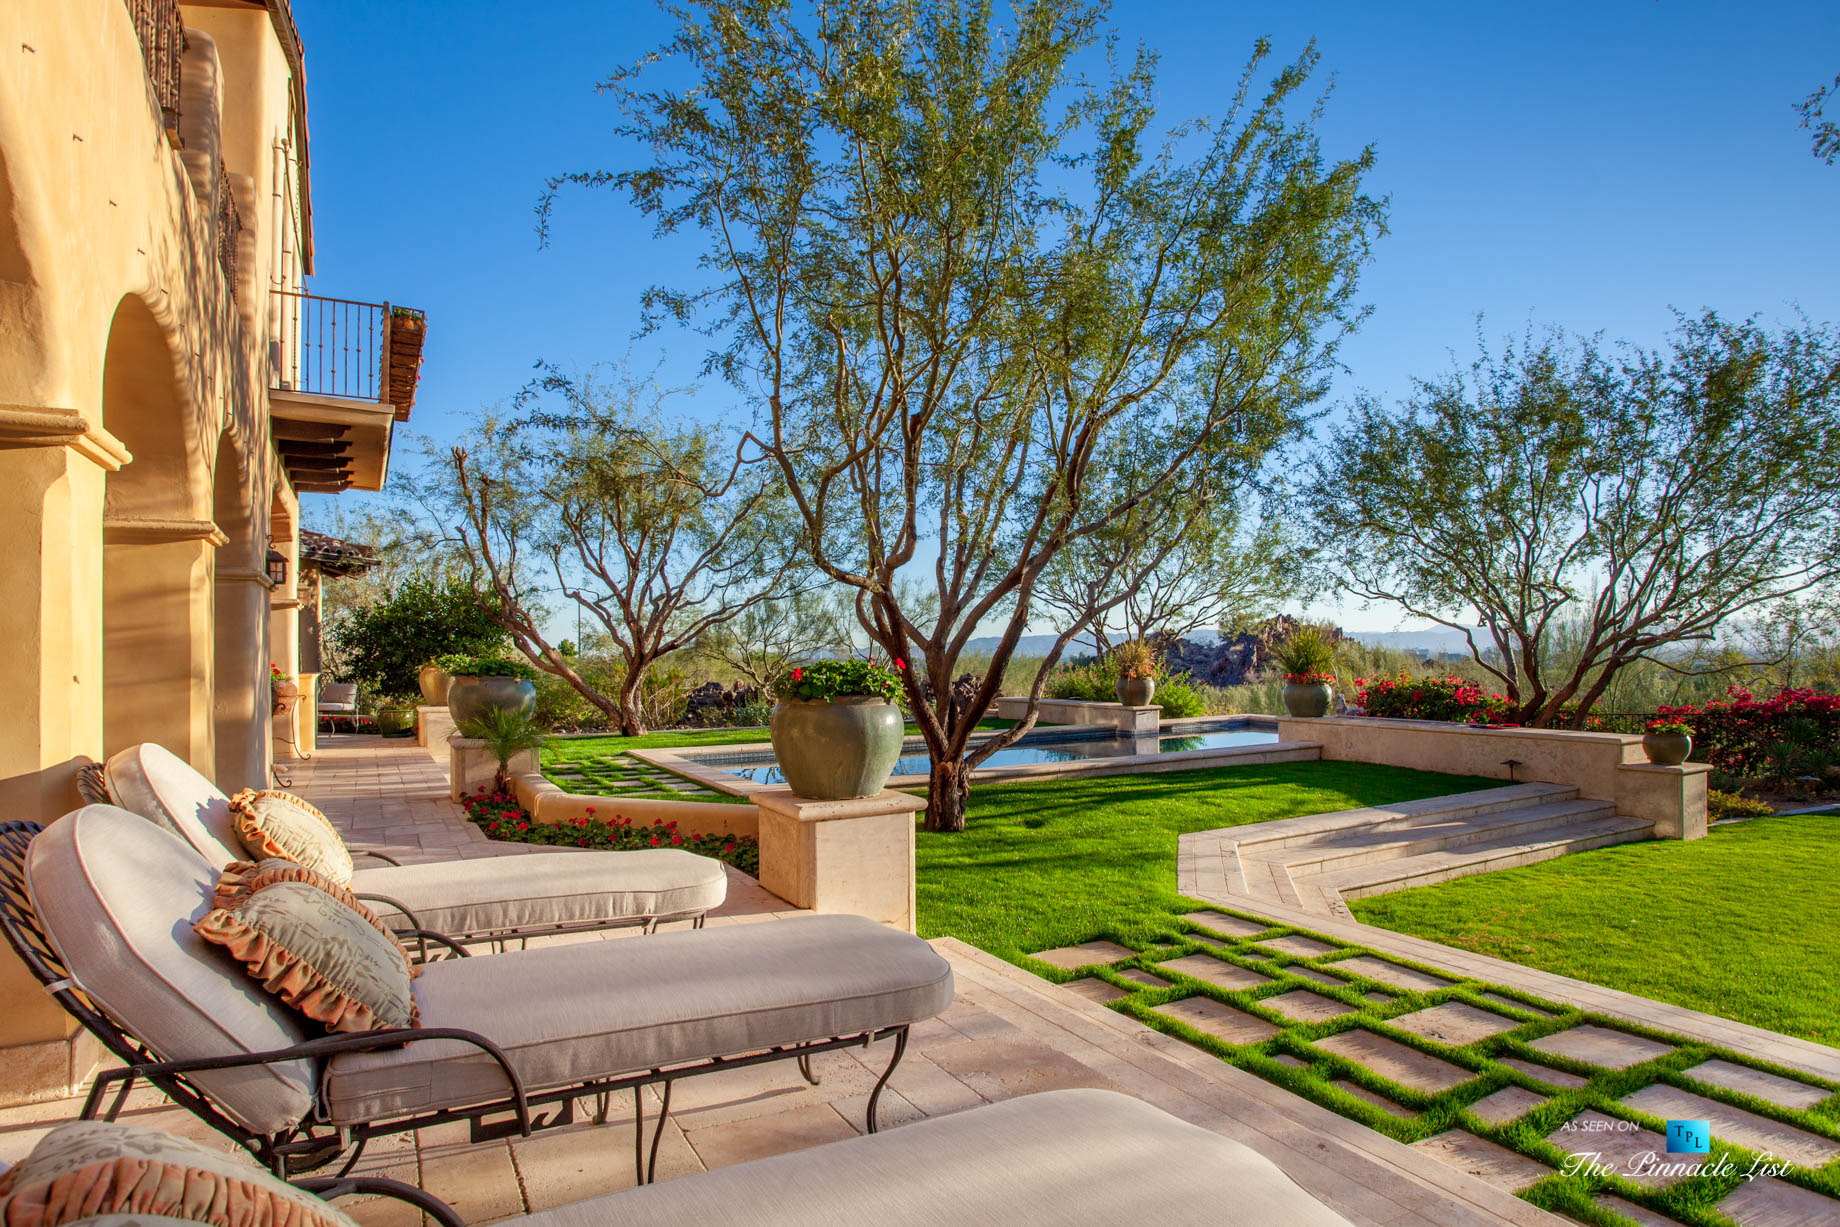 Spanish Colonial Biltmore Mountain Estate – 6539 N 31st Pl, Phoenix, AZ, USA – Pool Deck Lounge Chairs